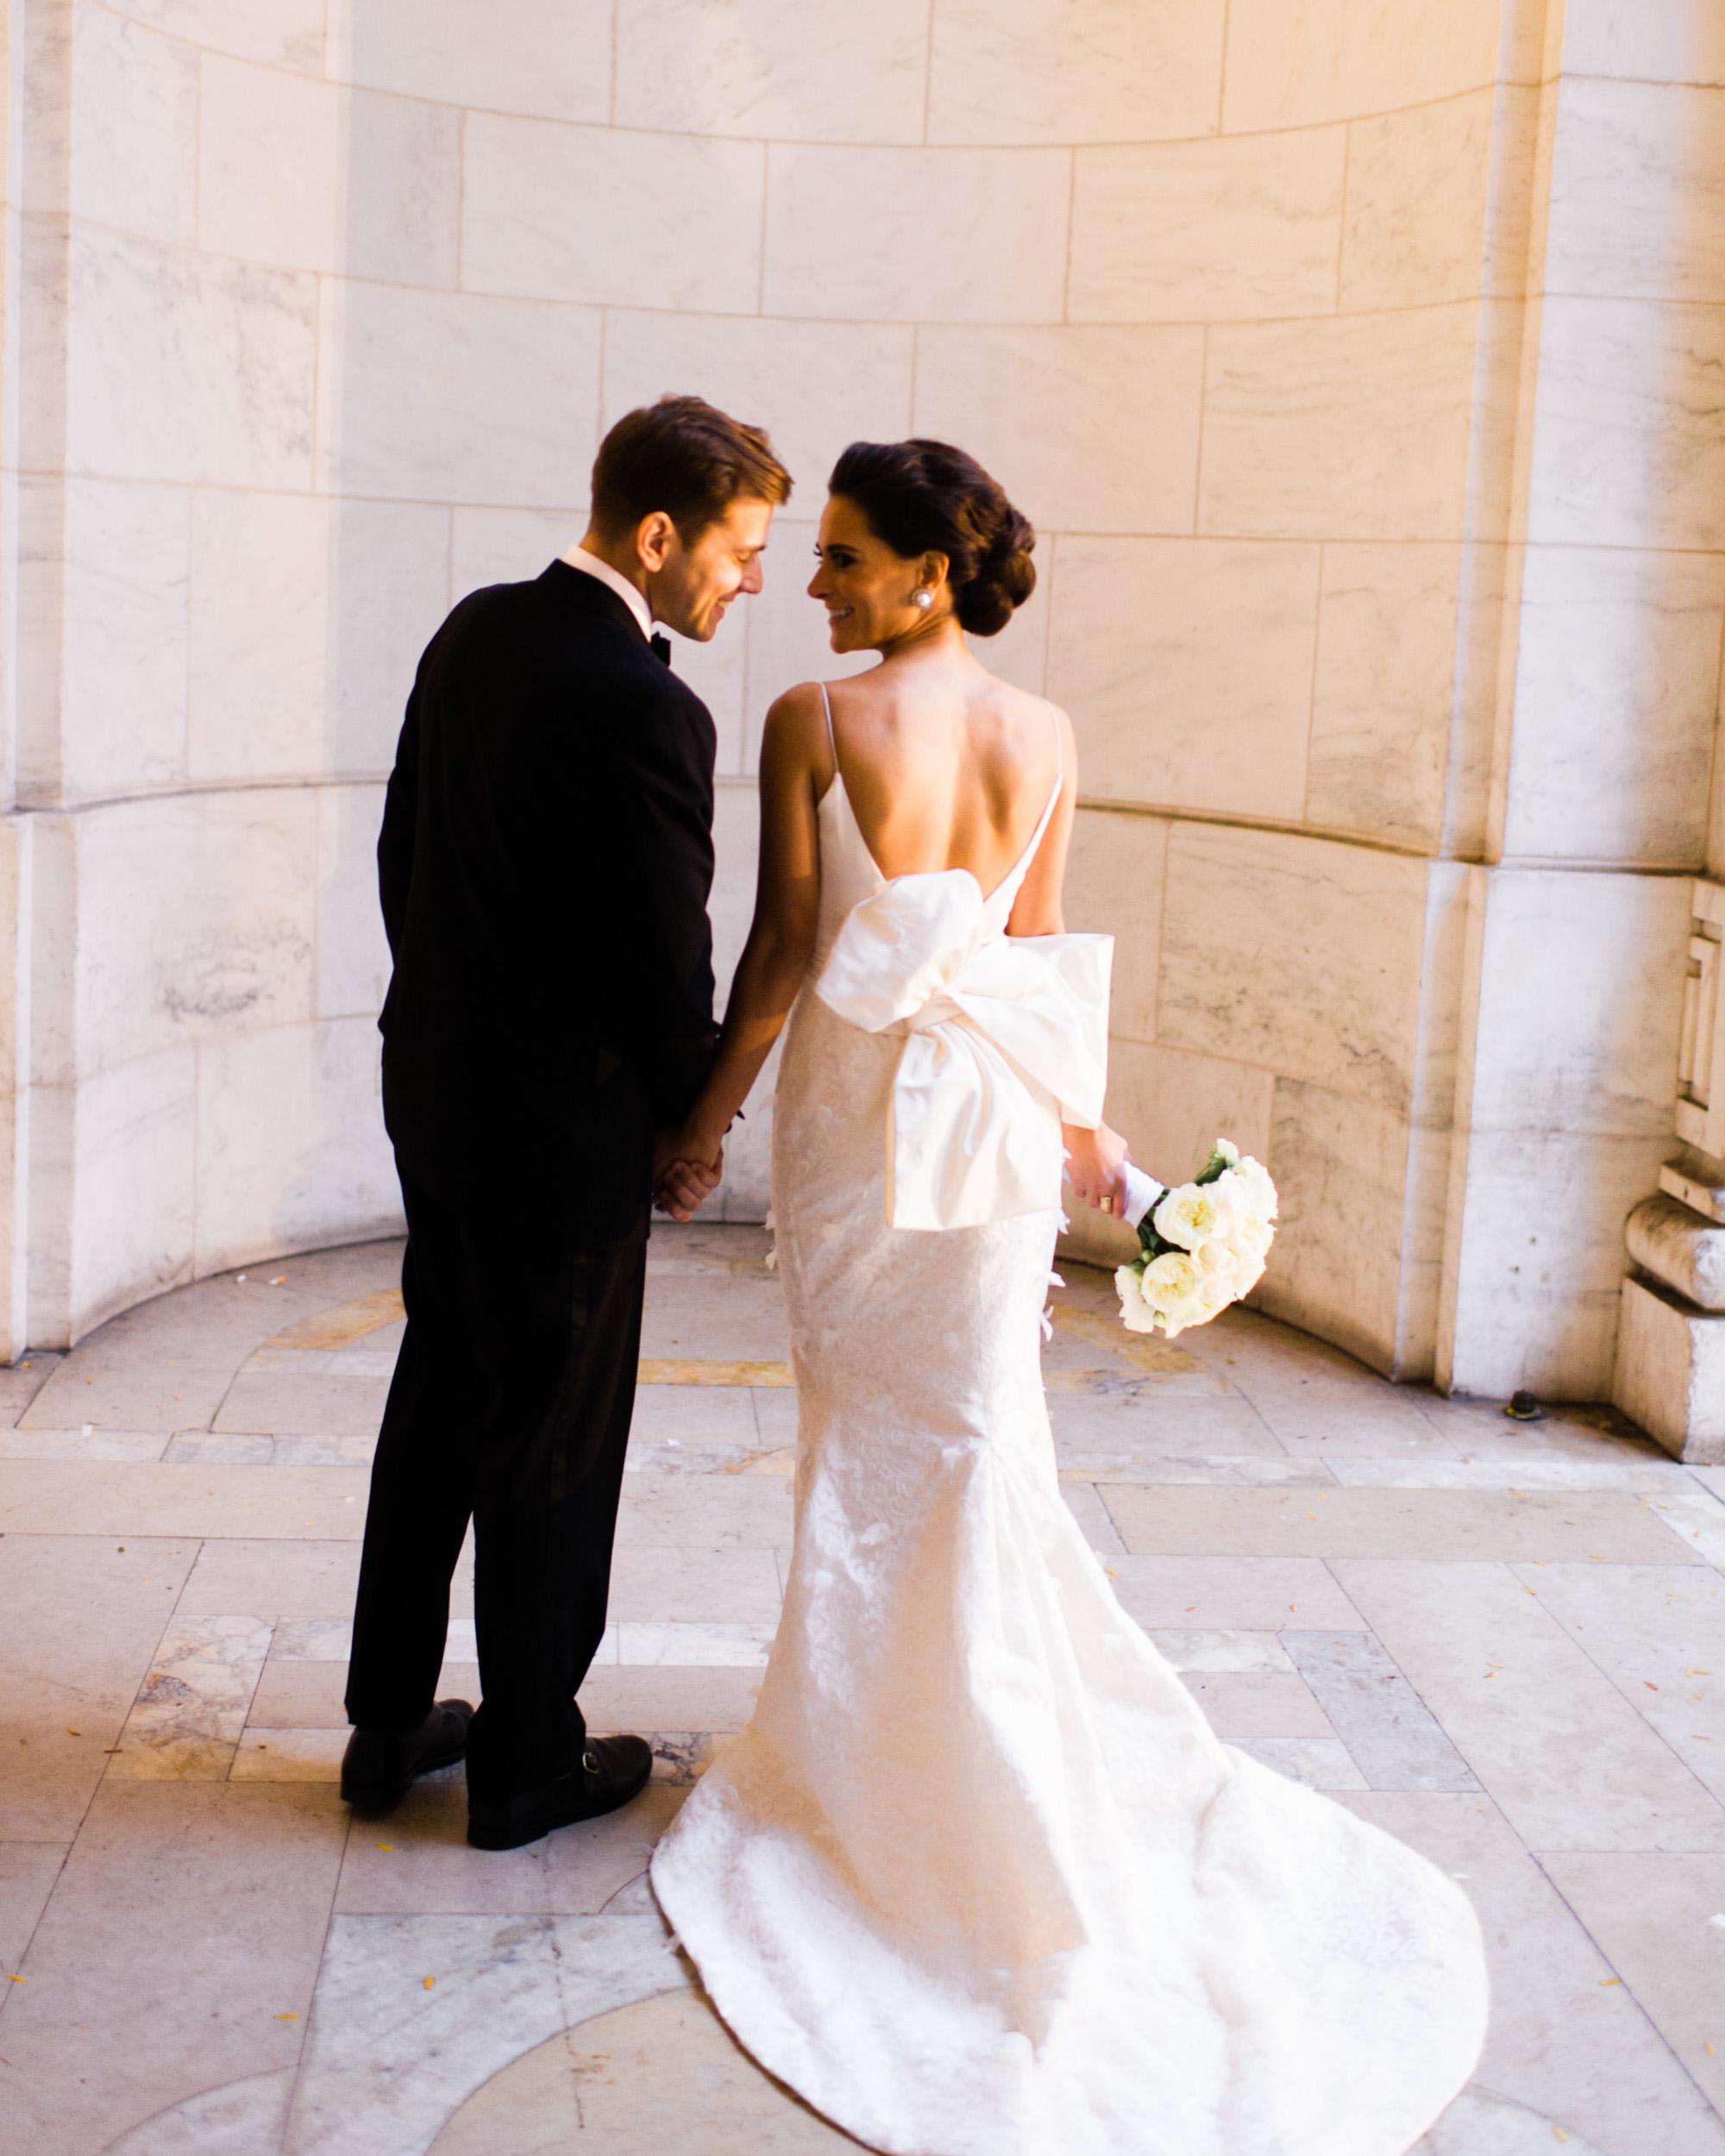 New York Public Library Wedding Photographer 82 - New York Public Library